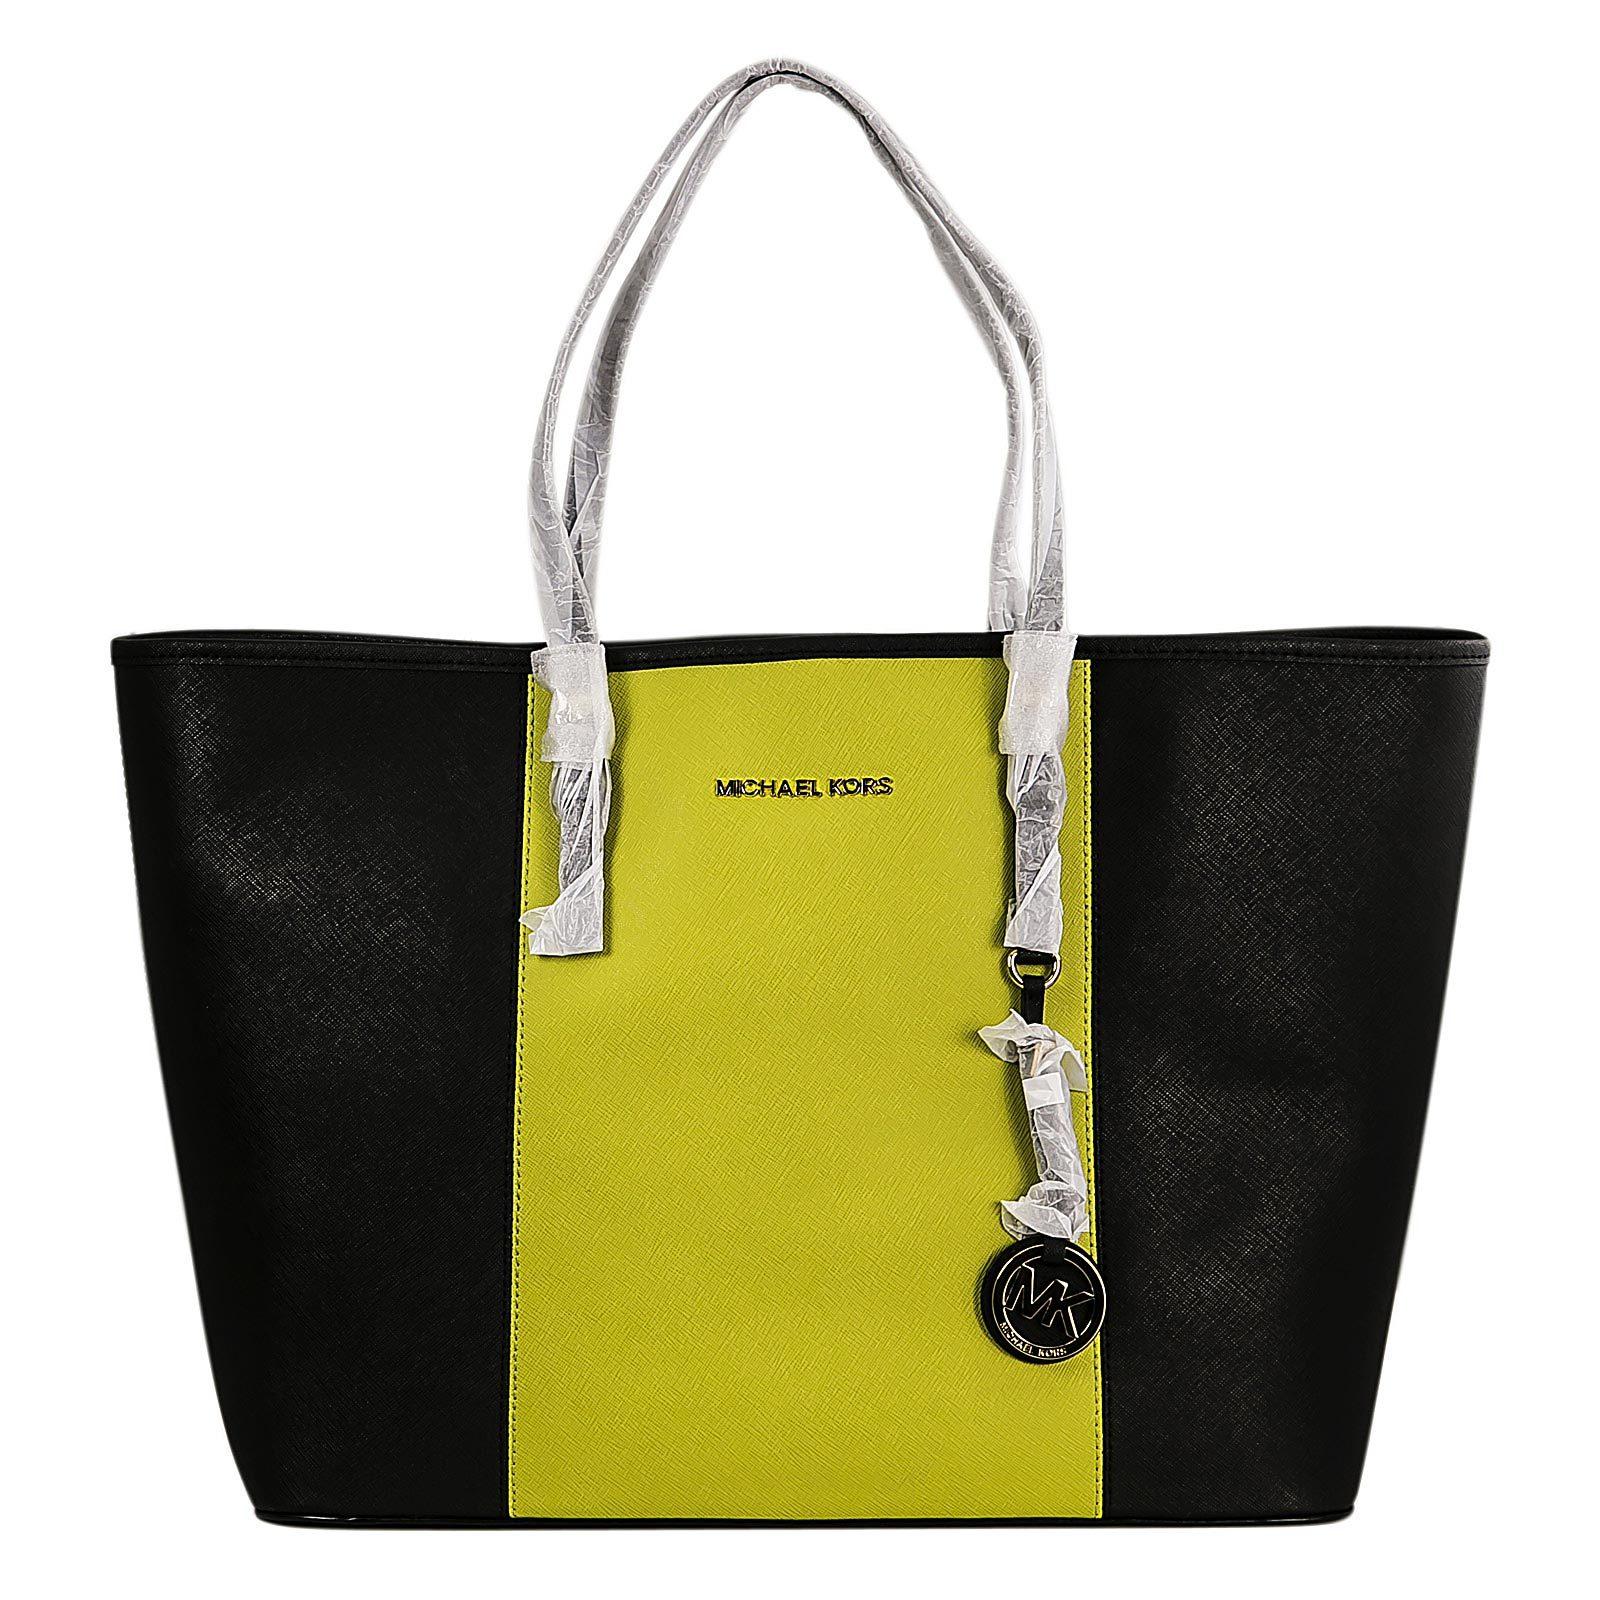 Michael Kors My Gift Shop